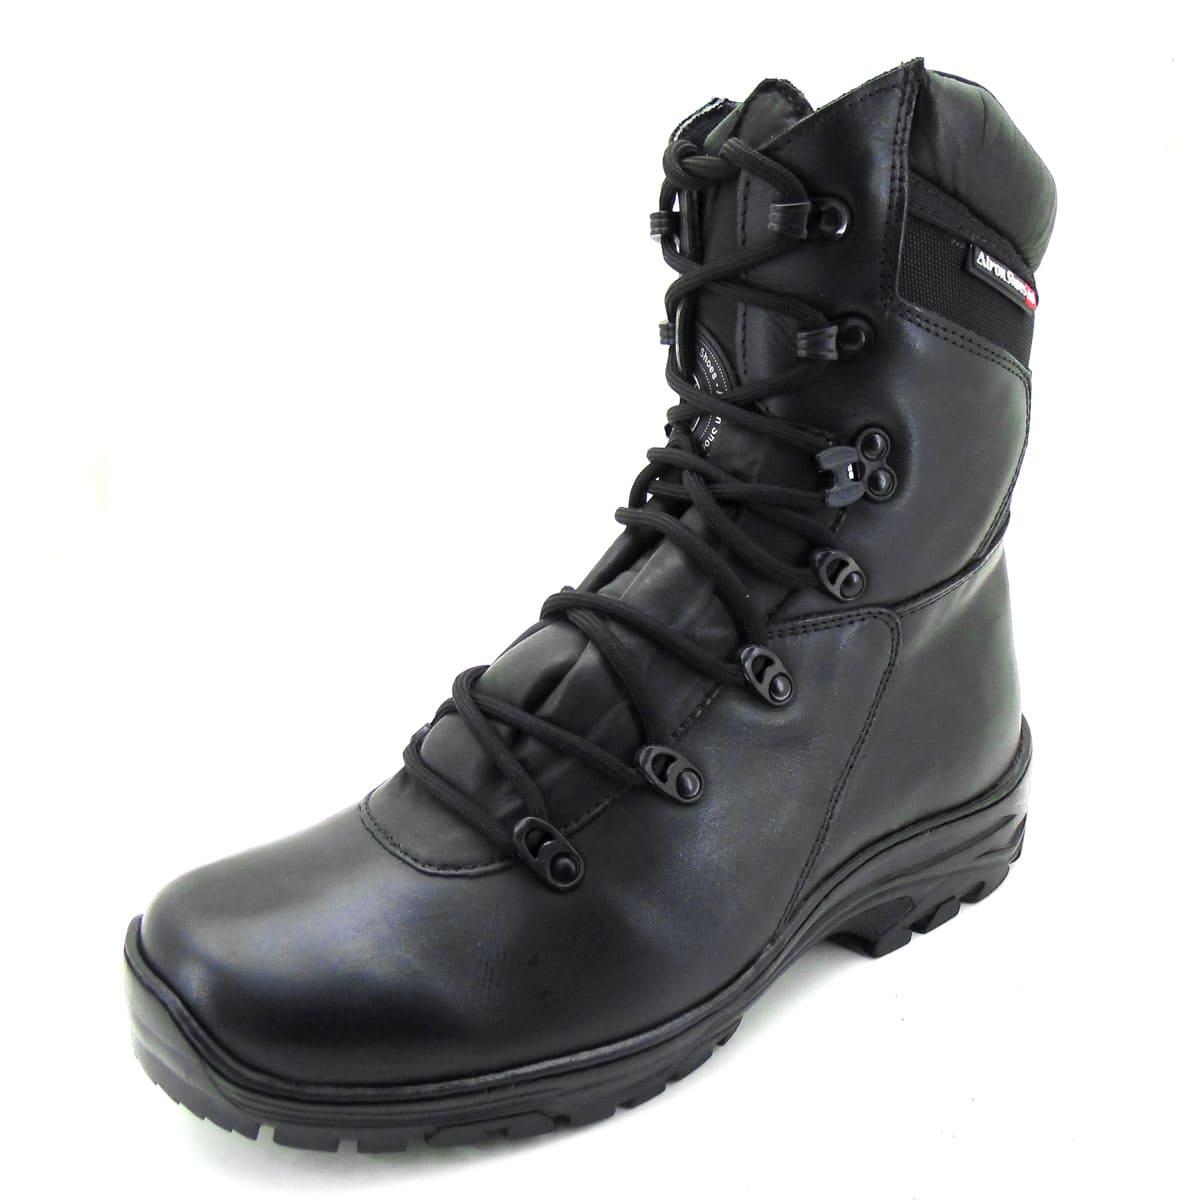 Bota militar de amarrar de couro legítimo na cor preta 280